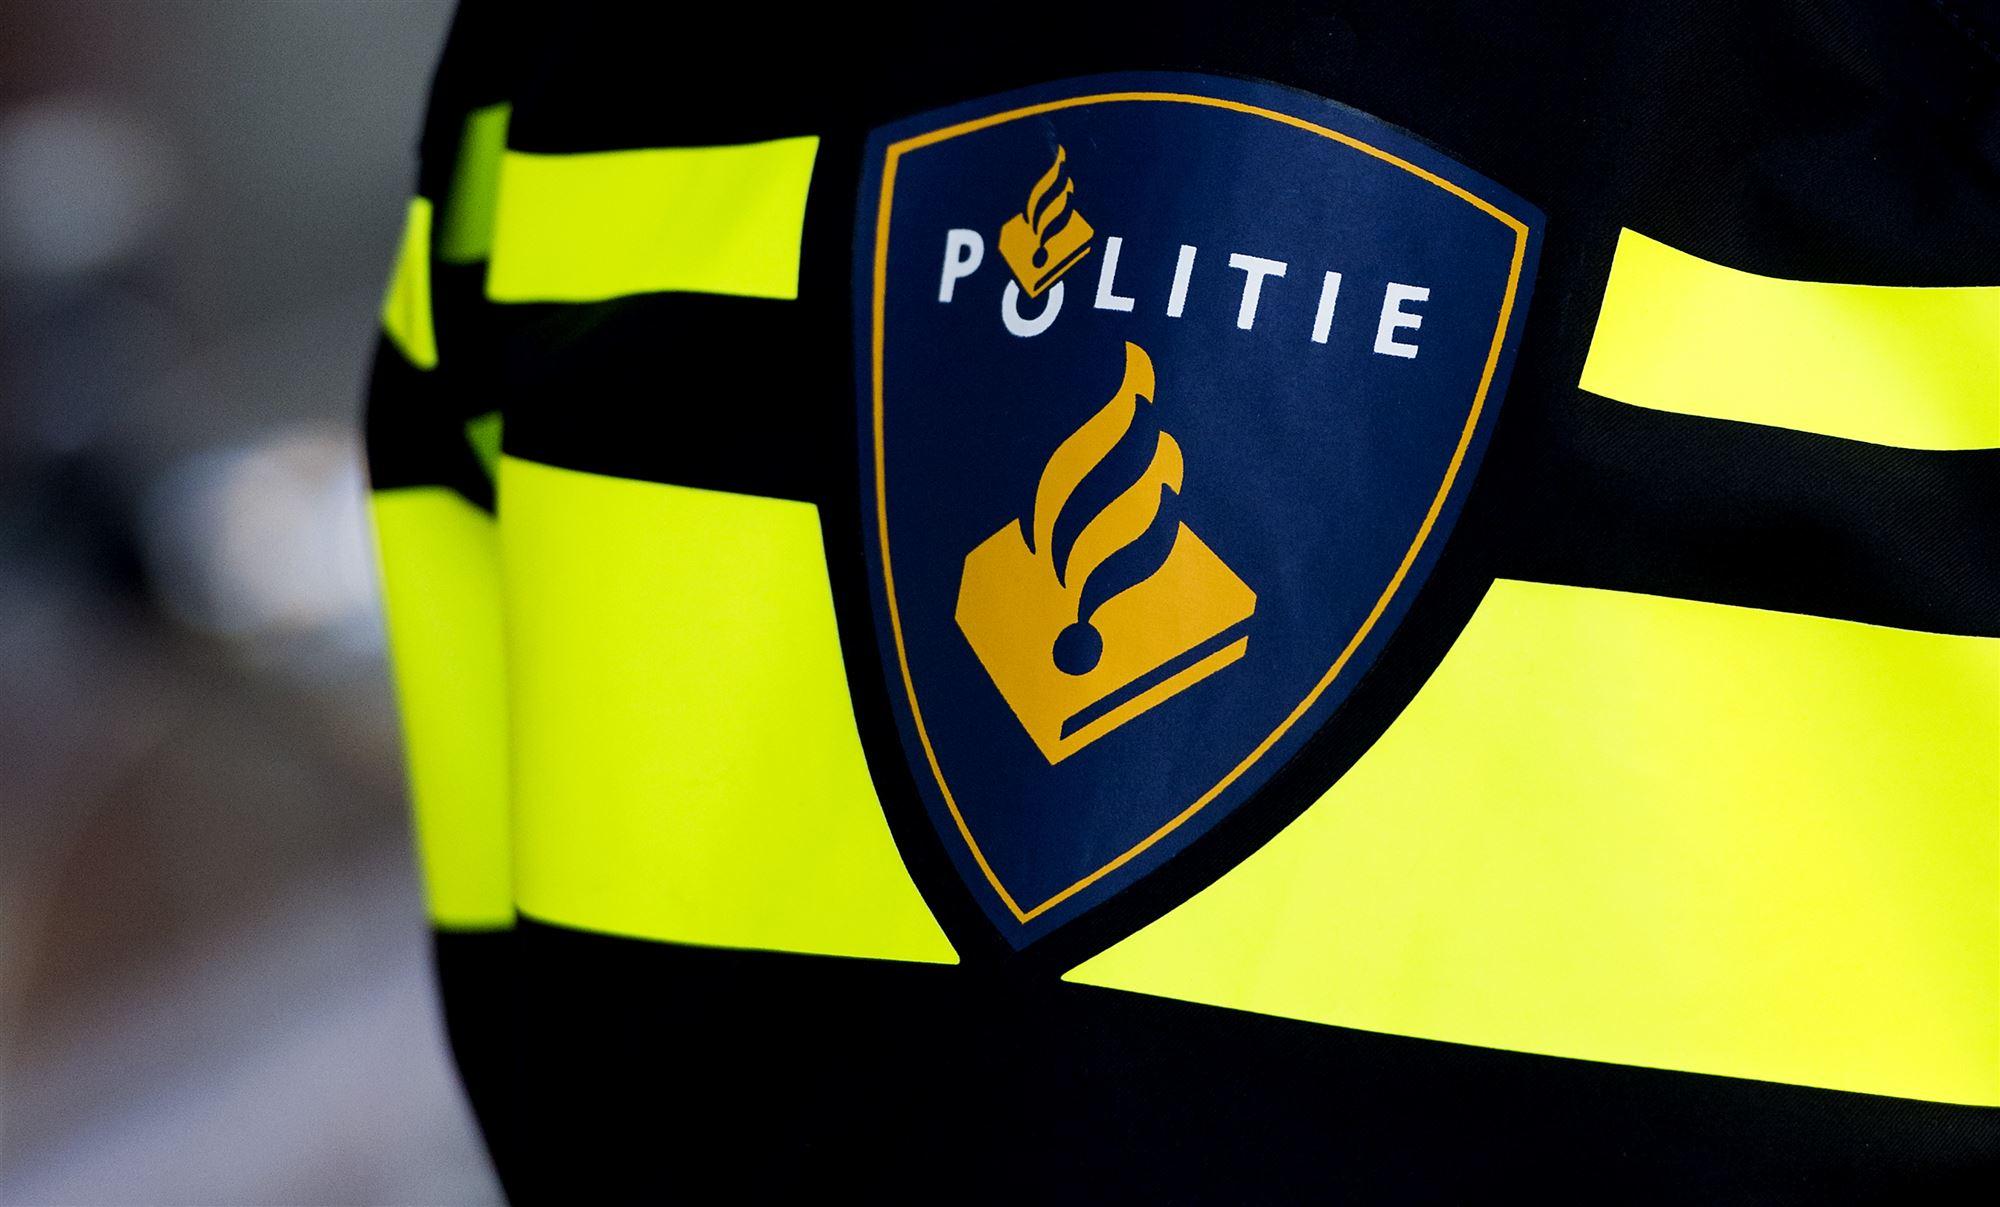 Politie ANP